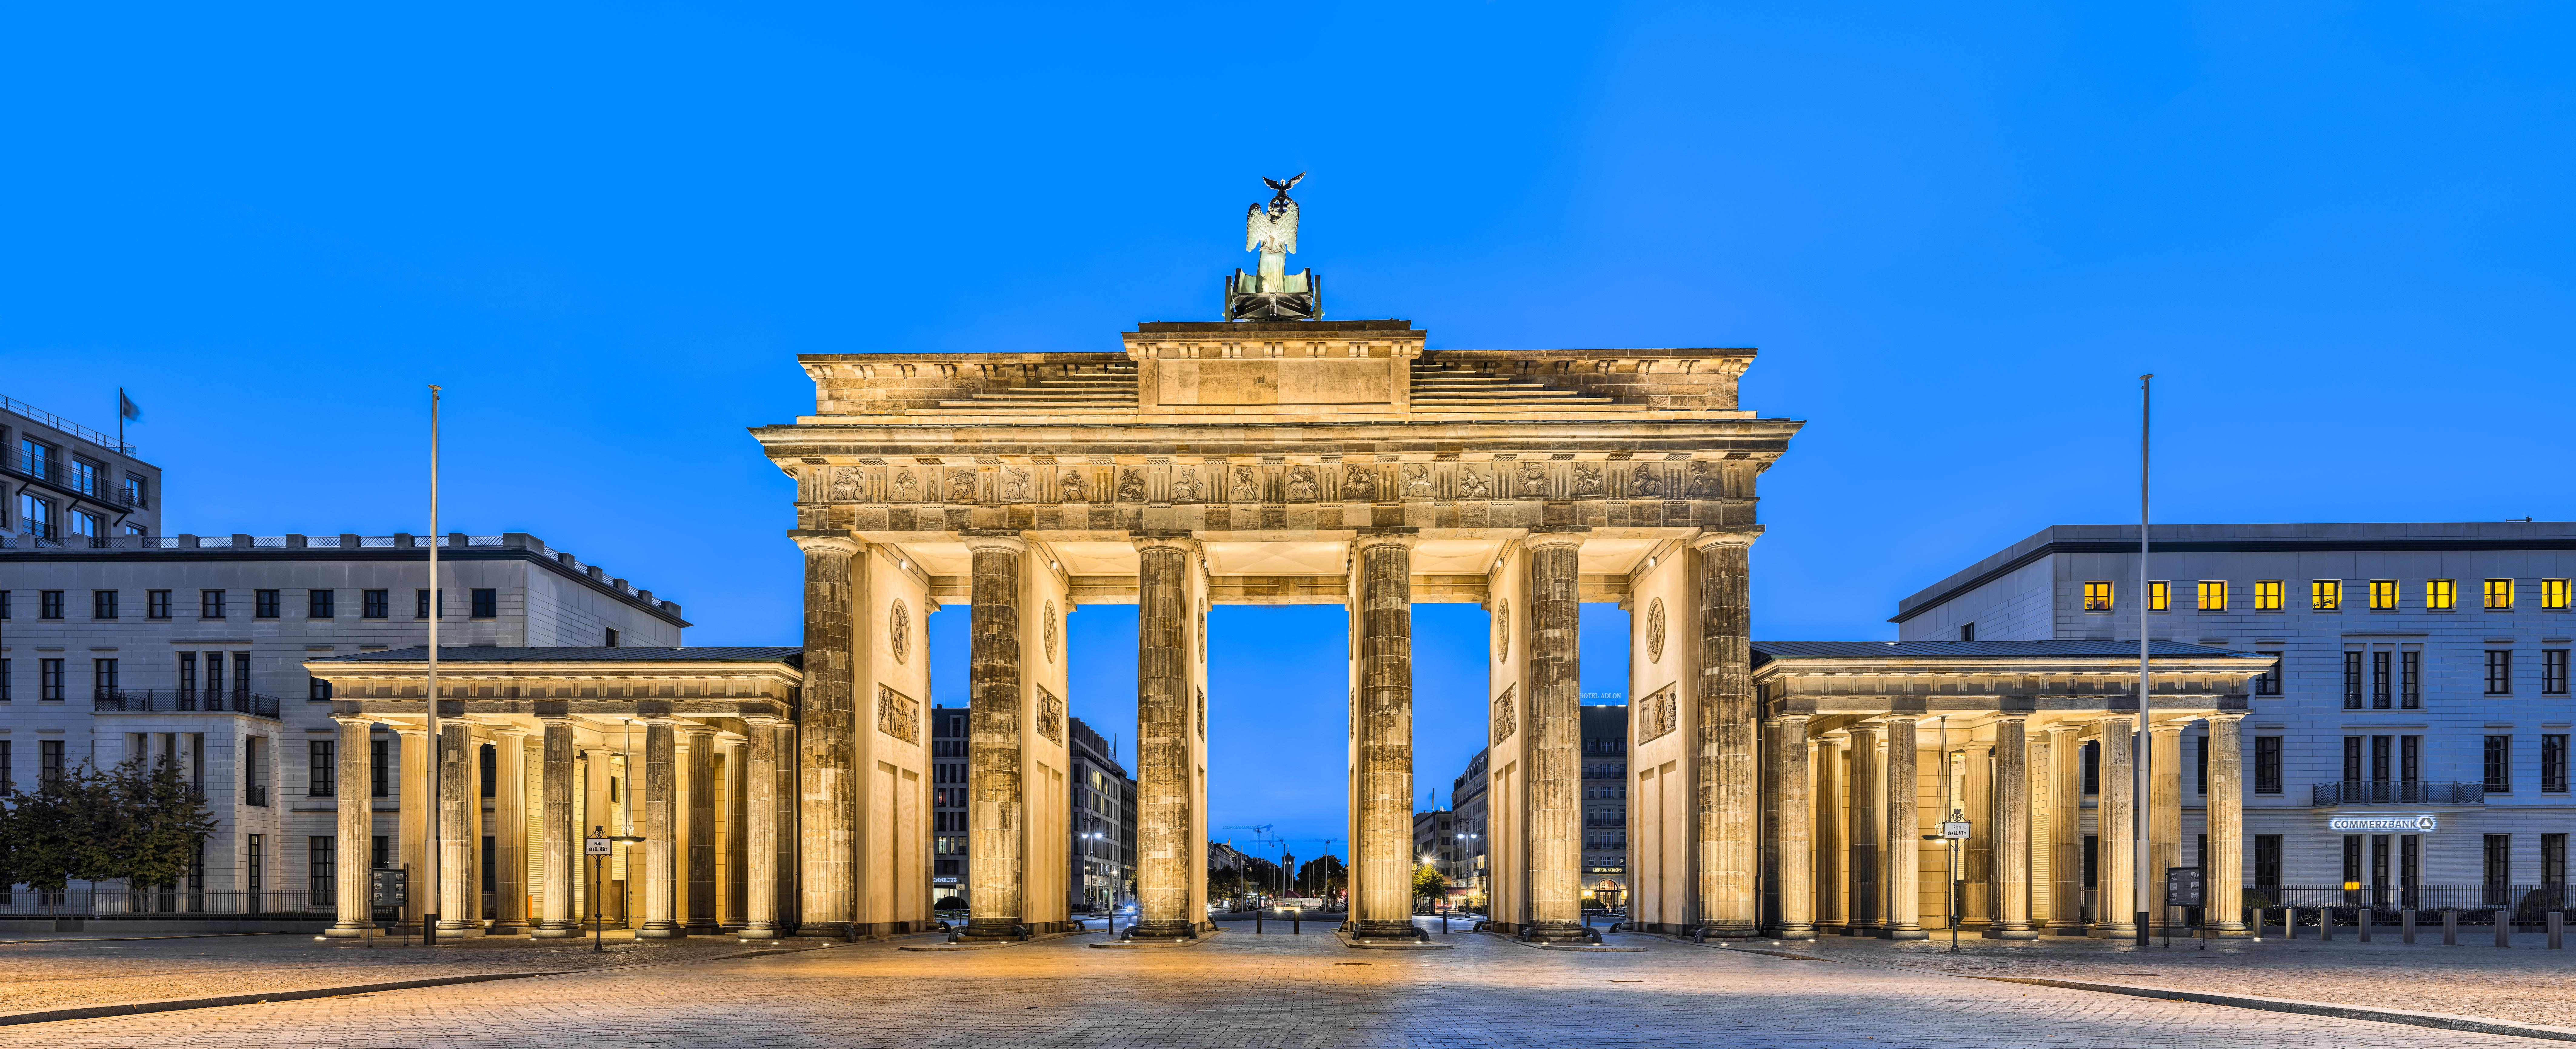 ville-de-berlin-photo